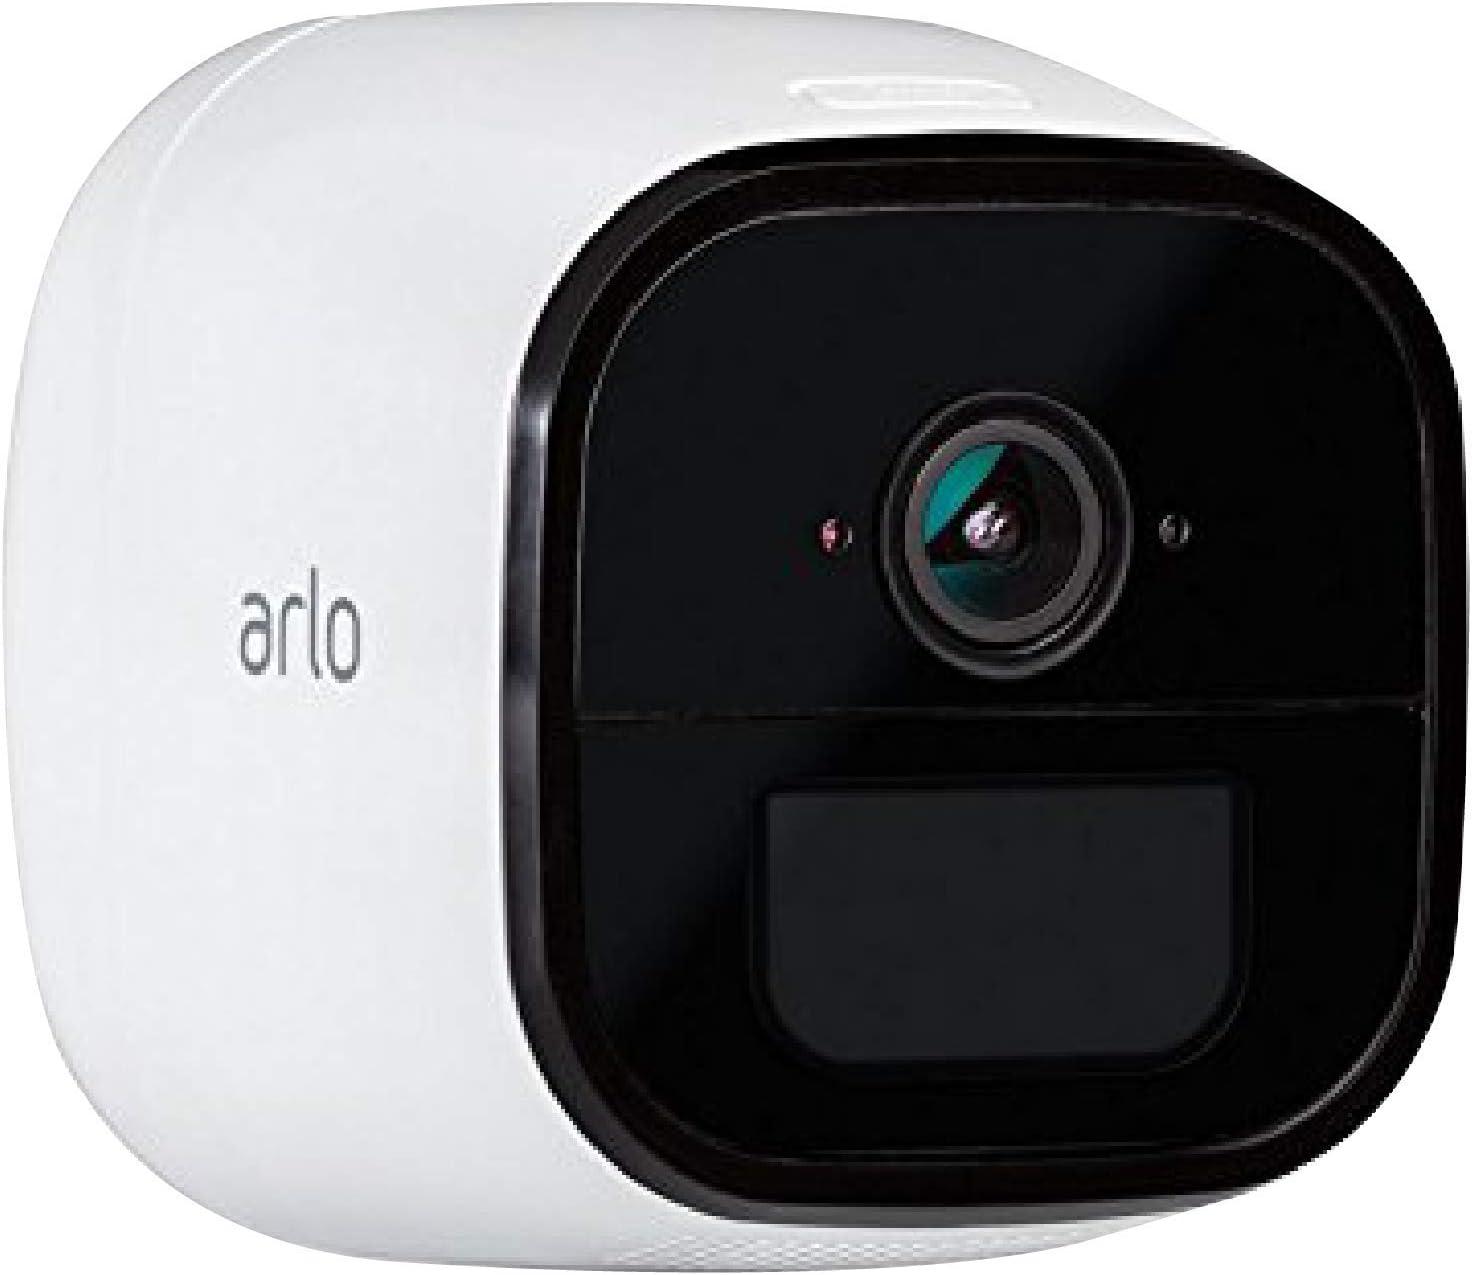 cellular security camera no wifi